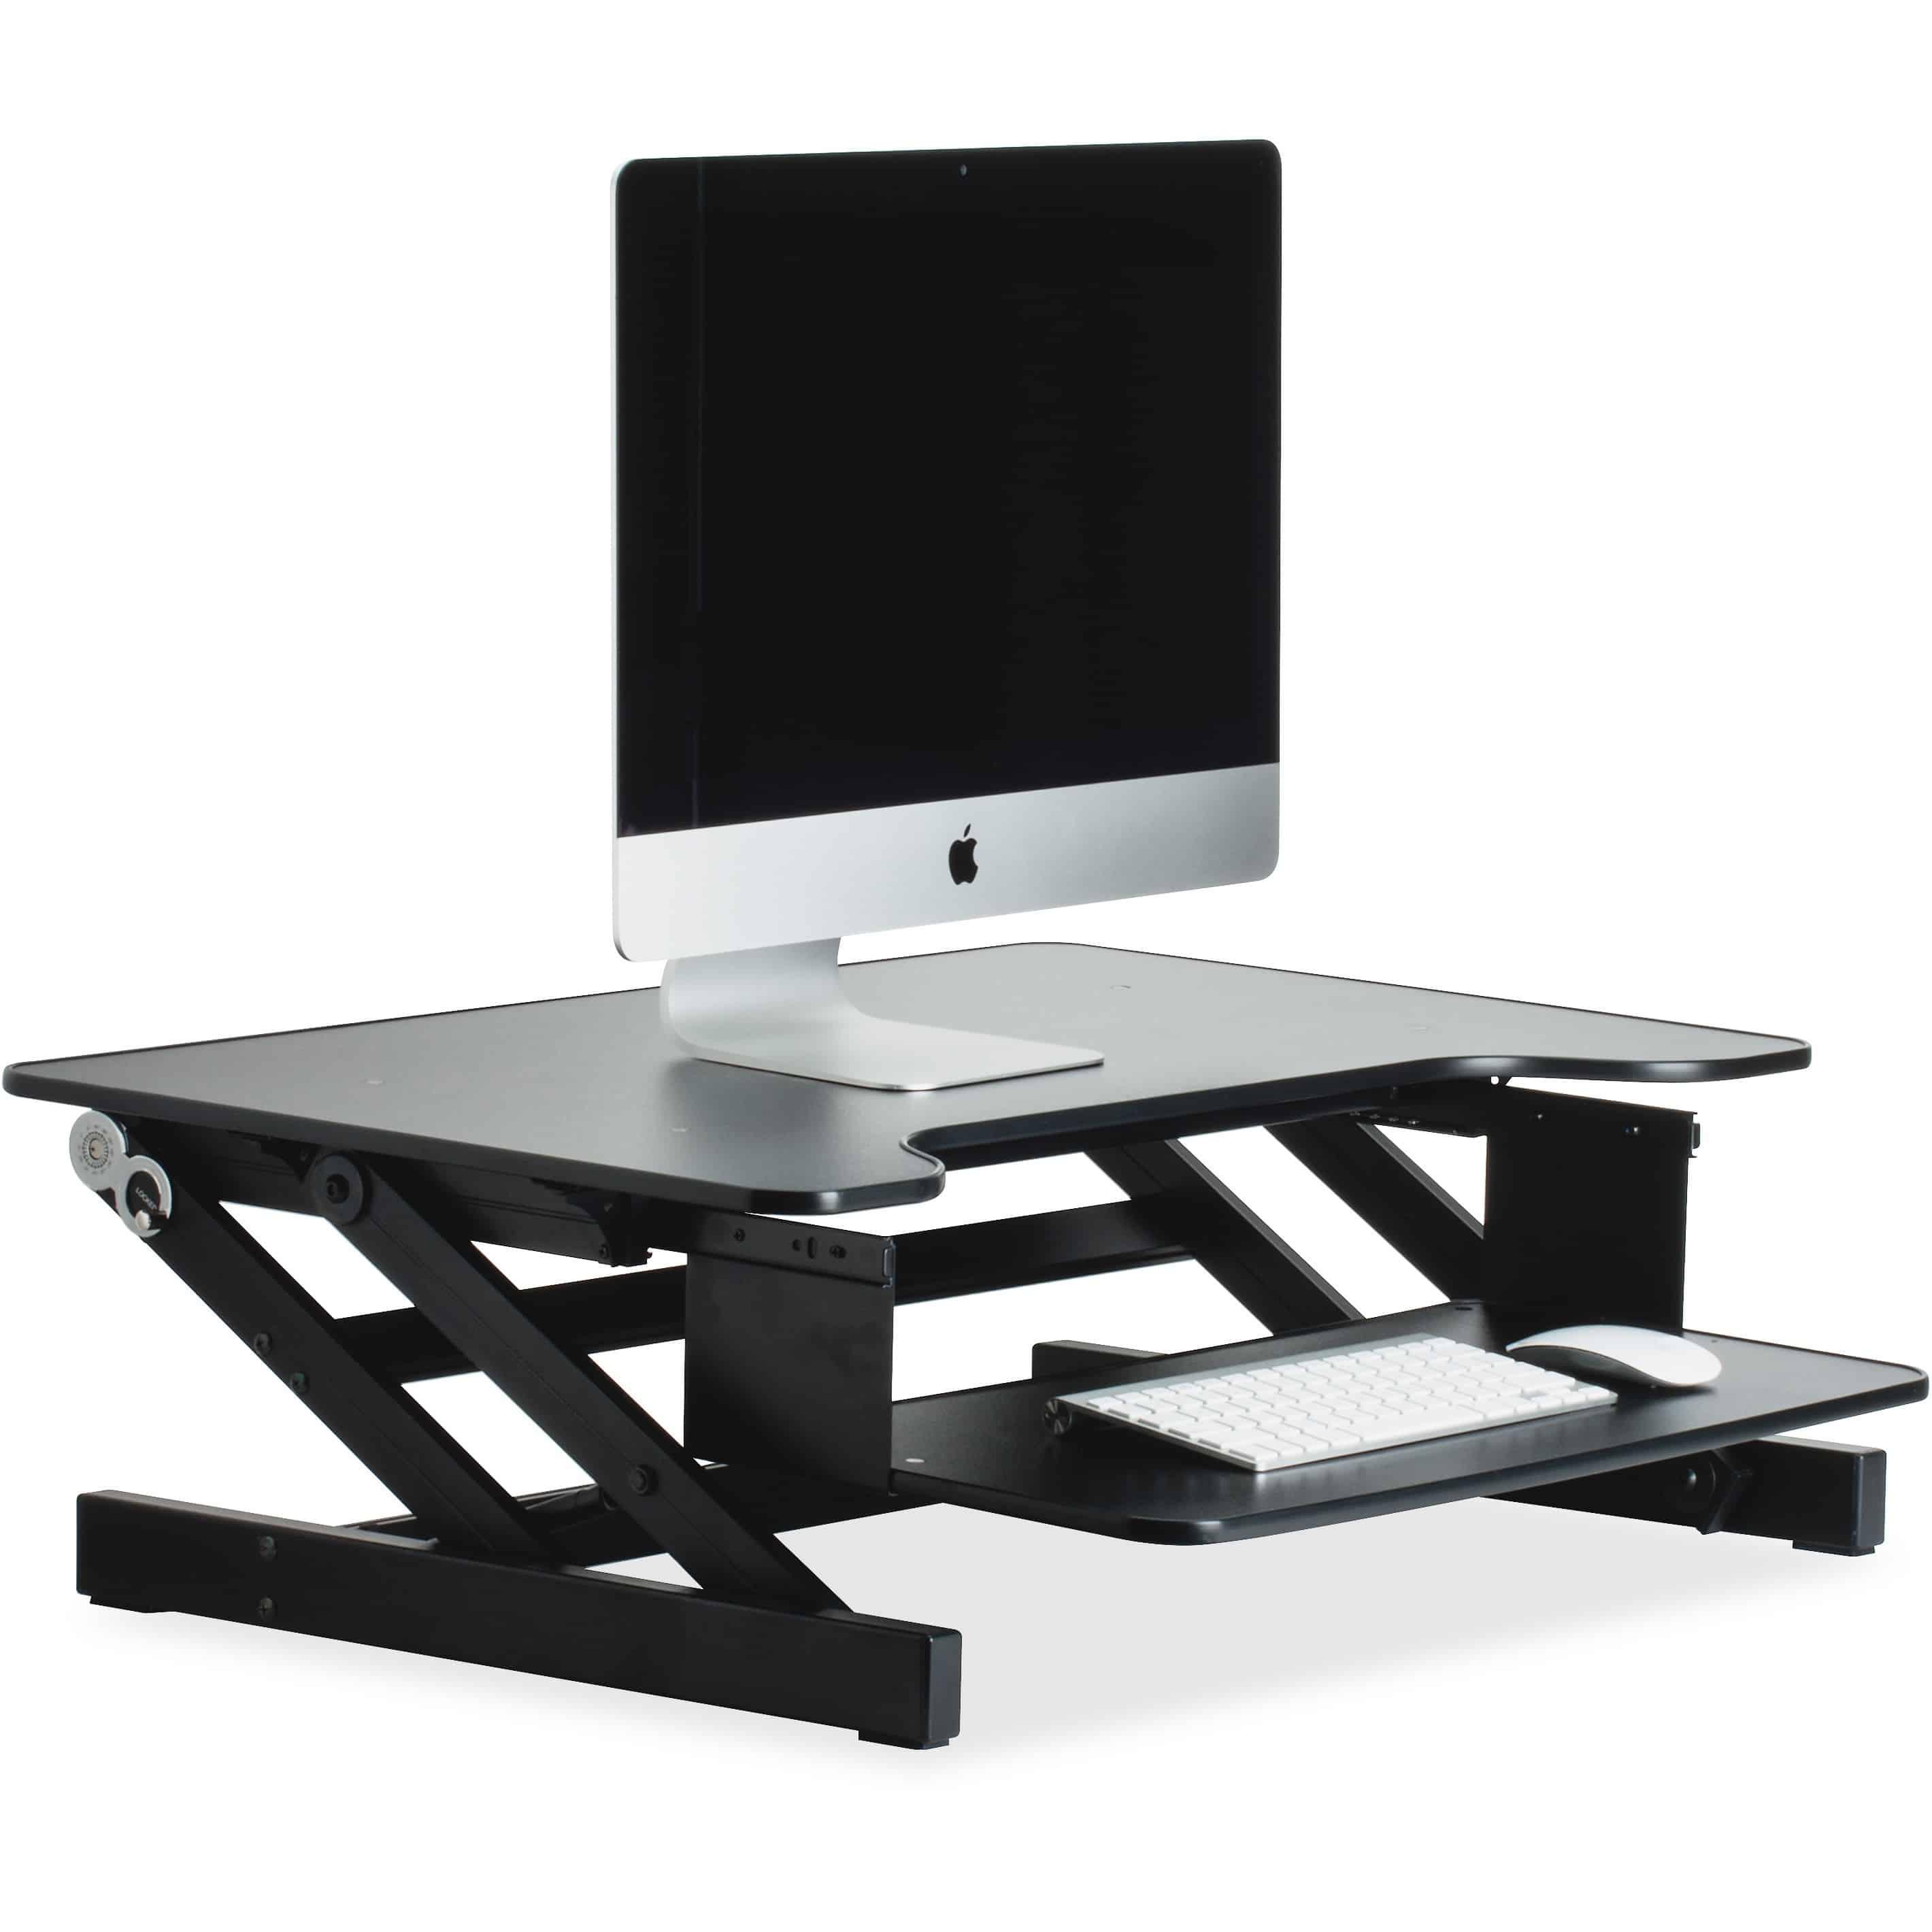 Lorell Standing Desk